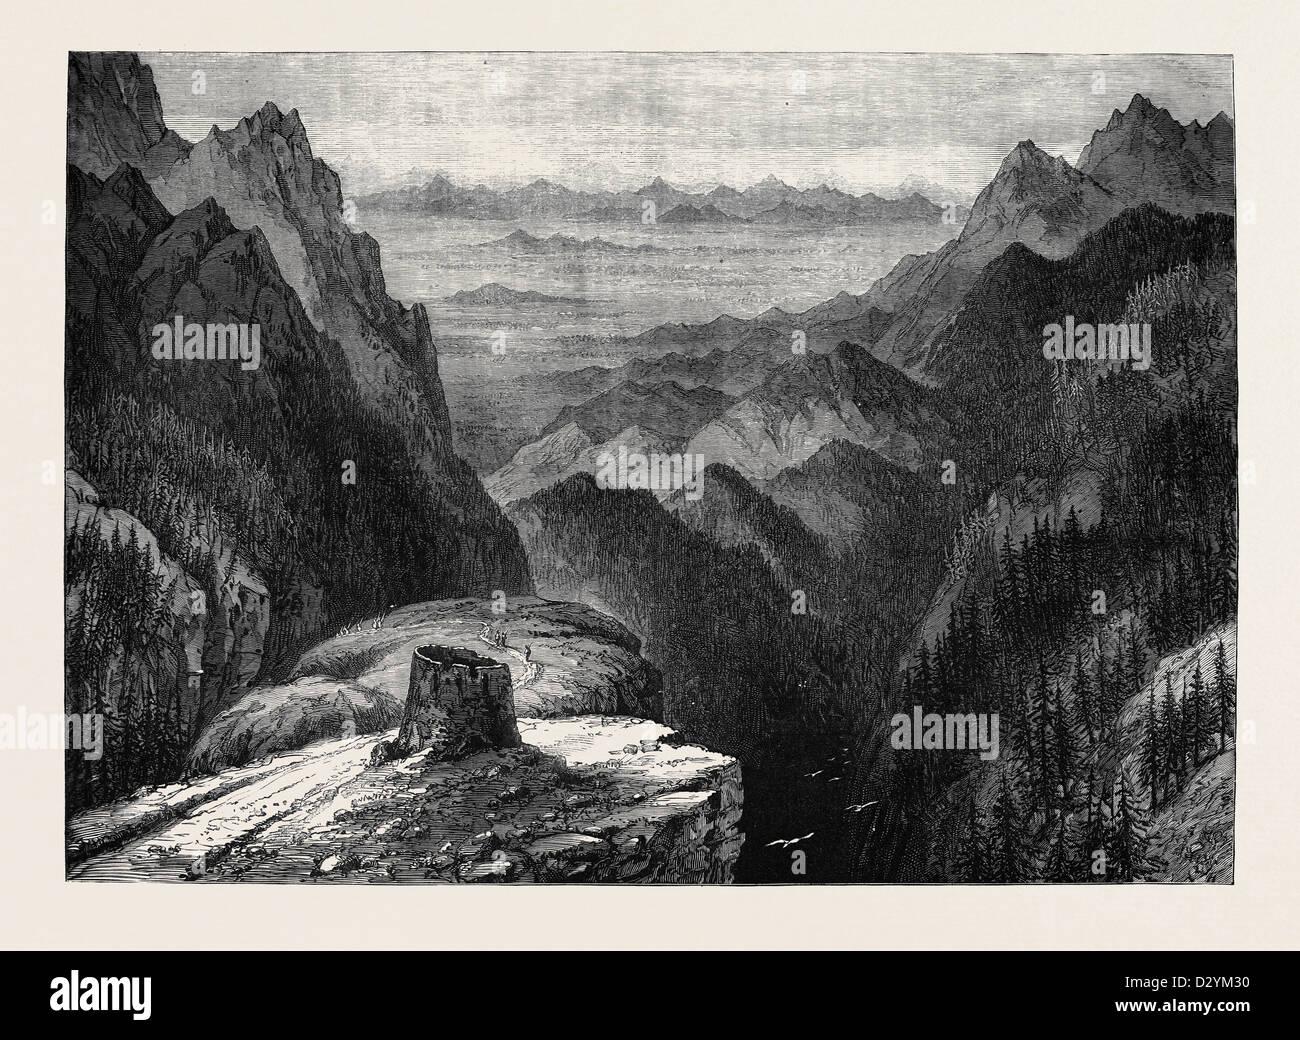 THE AFGHAN WAR: THE SHATURGARDAN 1879 - Stock Image